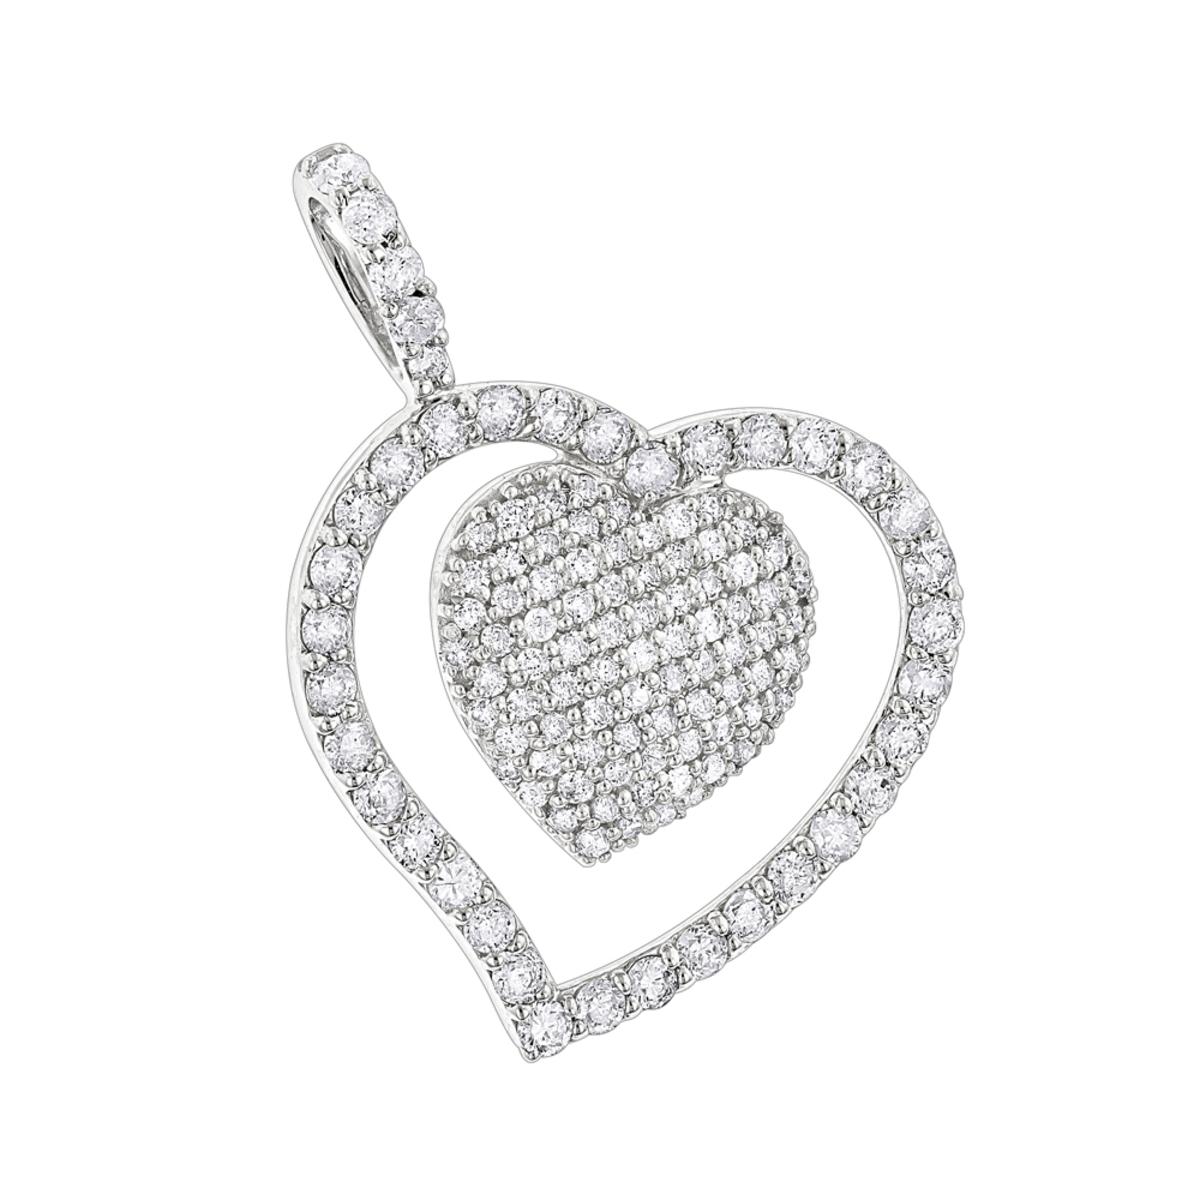 Heart Jewelry 14K Designer Diamond Heart Pendant 0.9ct